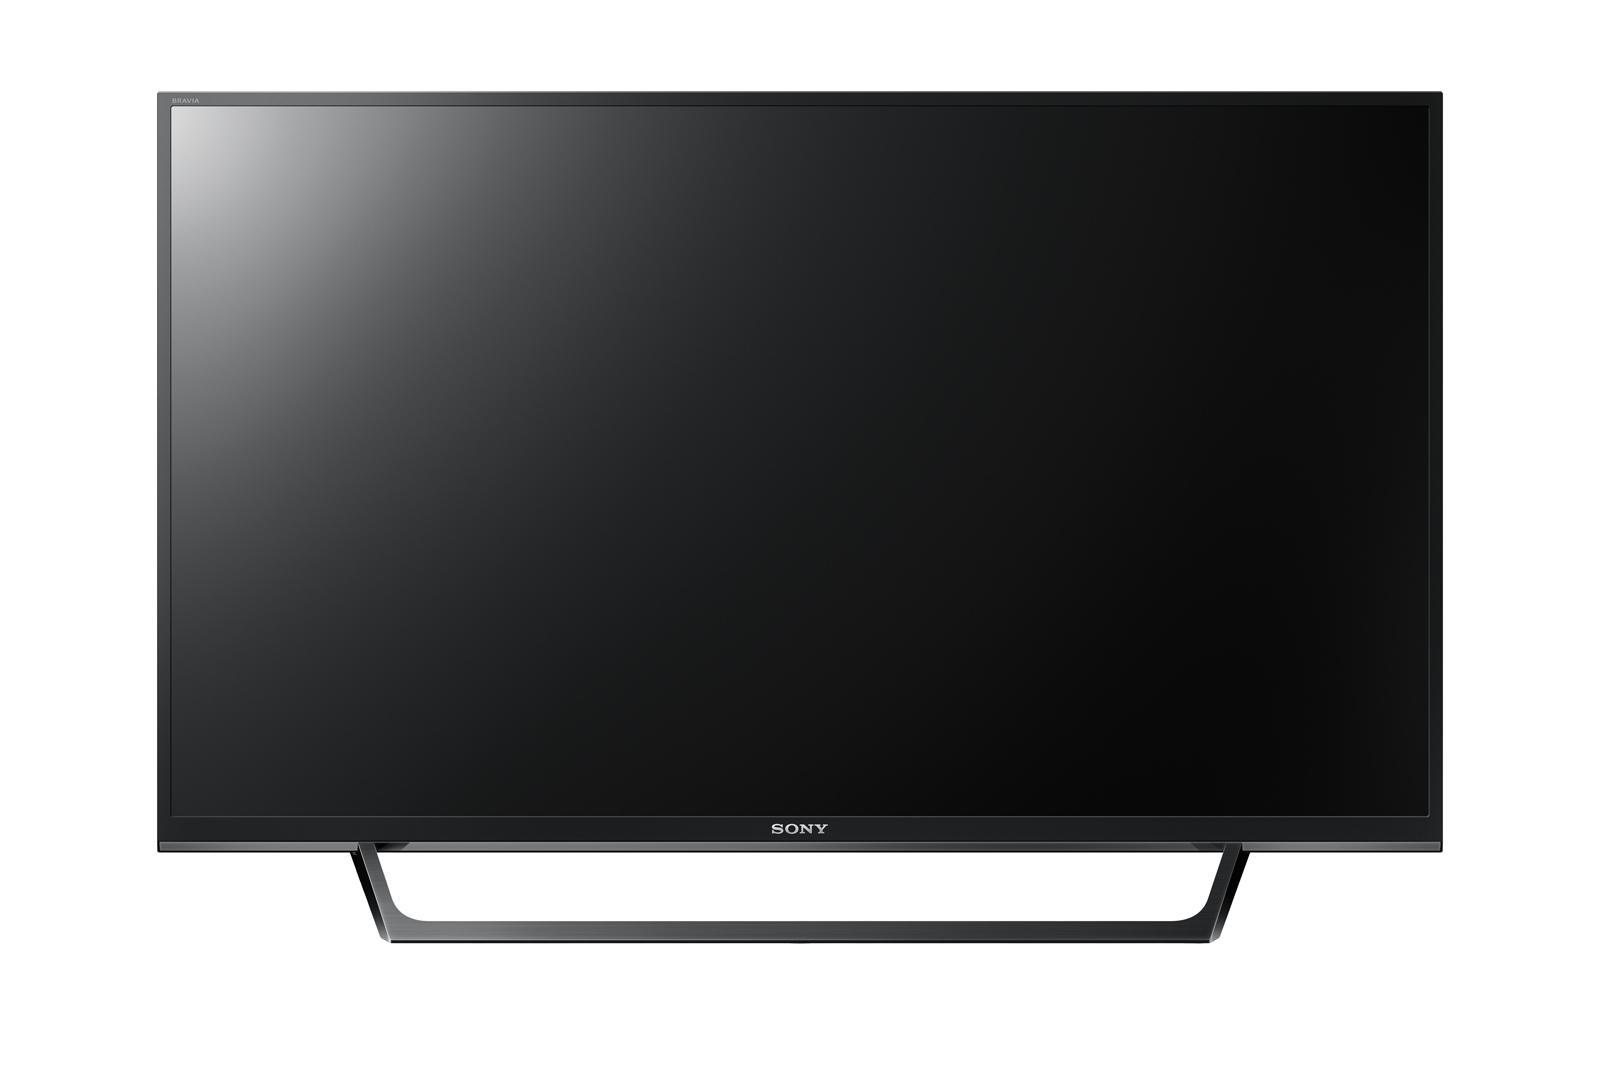 Televizorius Tv 40 Led Sony Kdl 40we665 400hz Smarttv Zema Kaina Varle Lt